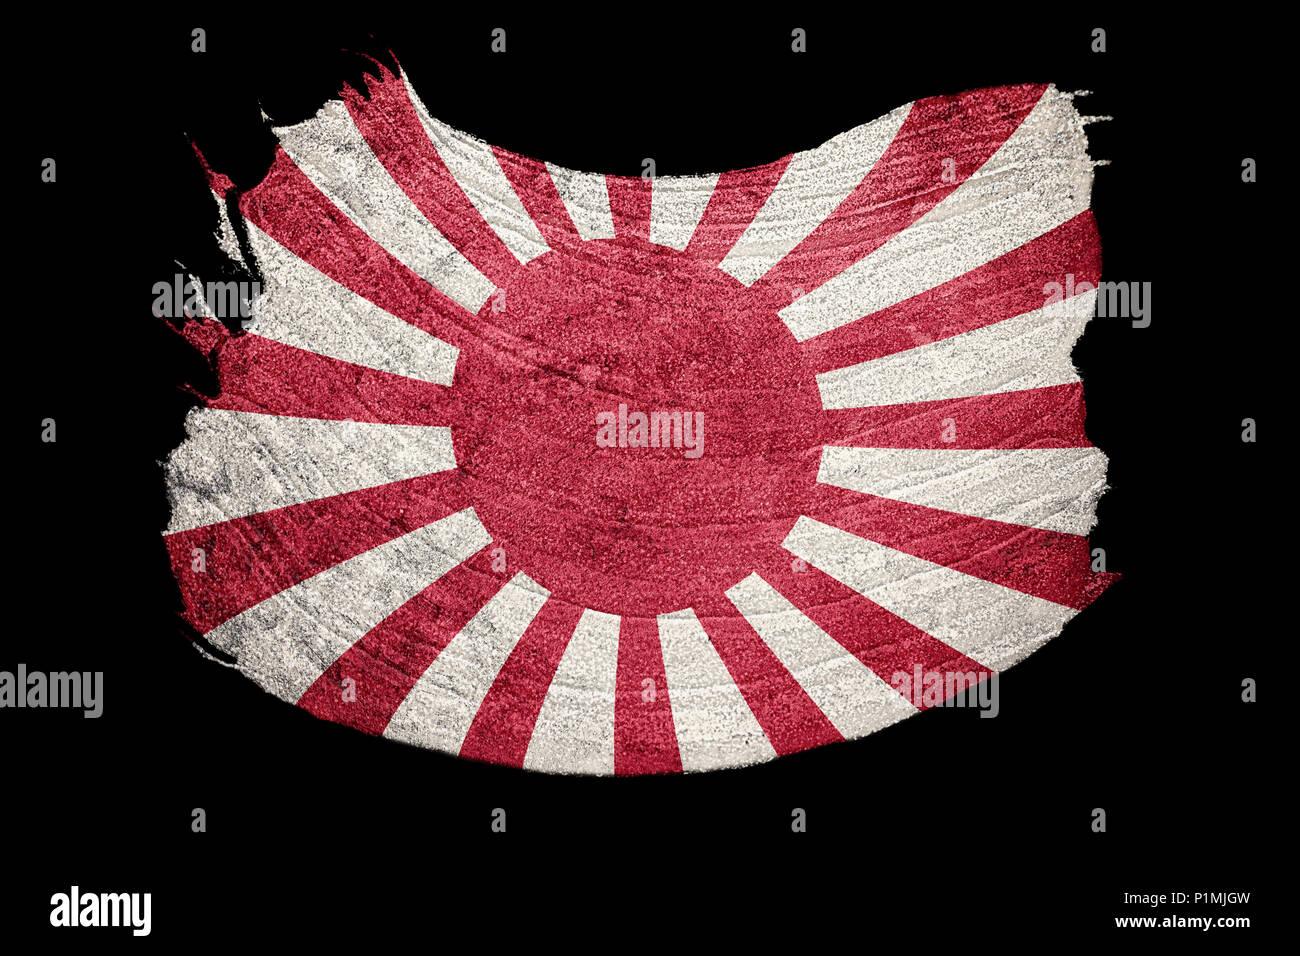 Grunge Rising Sun Japan flag. Japan flag with grunge texture. Brush stroke. - Stock Image